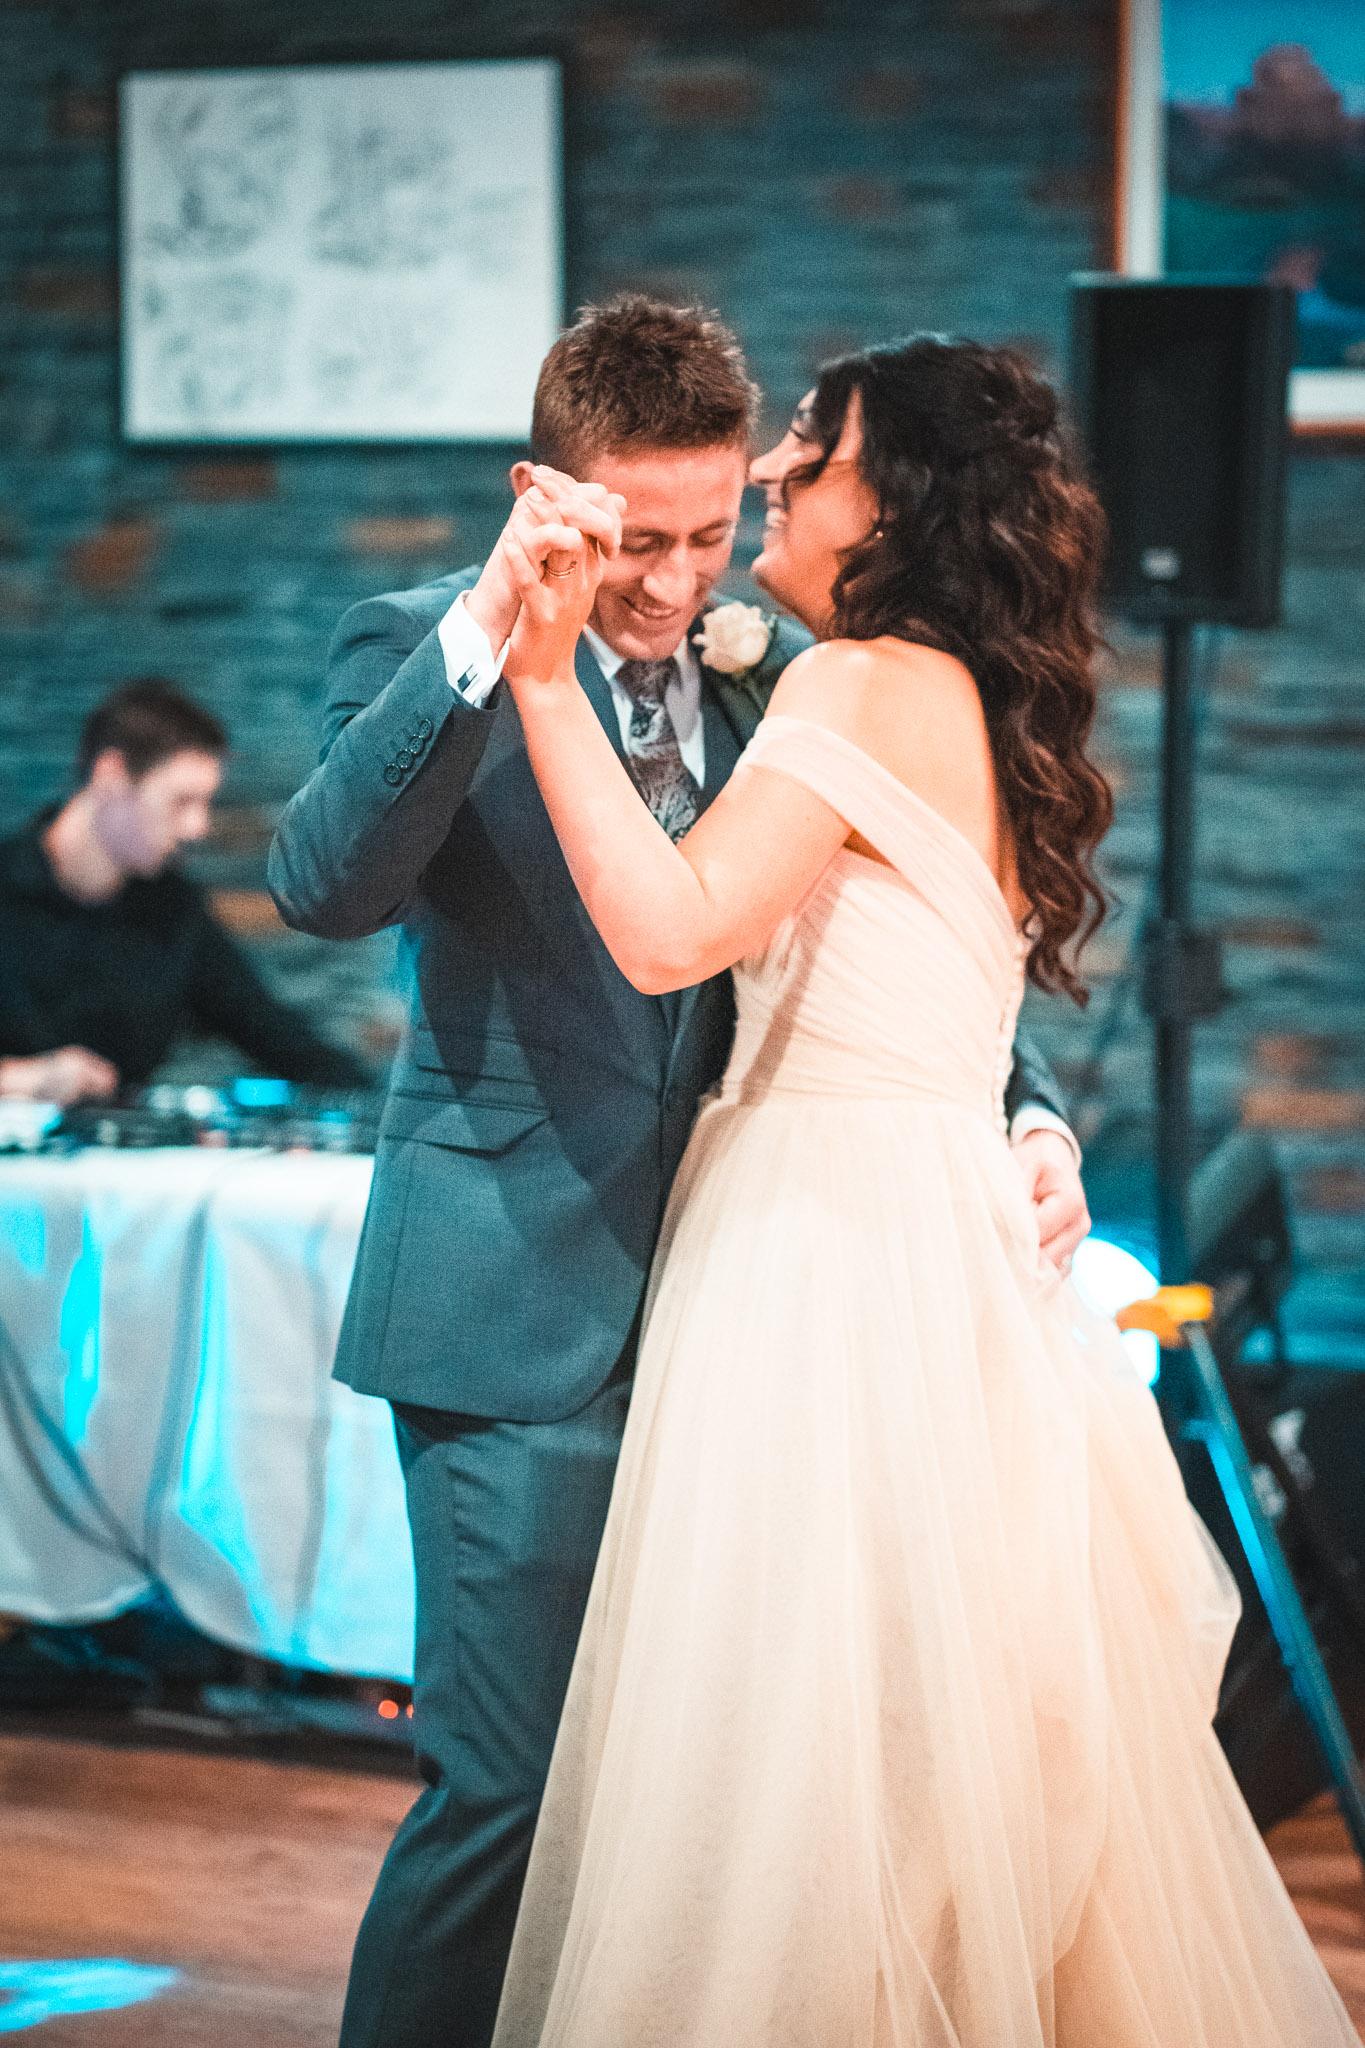 WeddingReception-9233.JPG